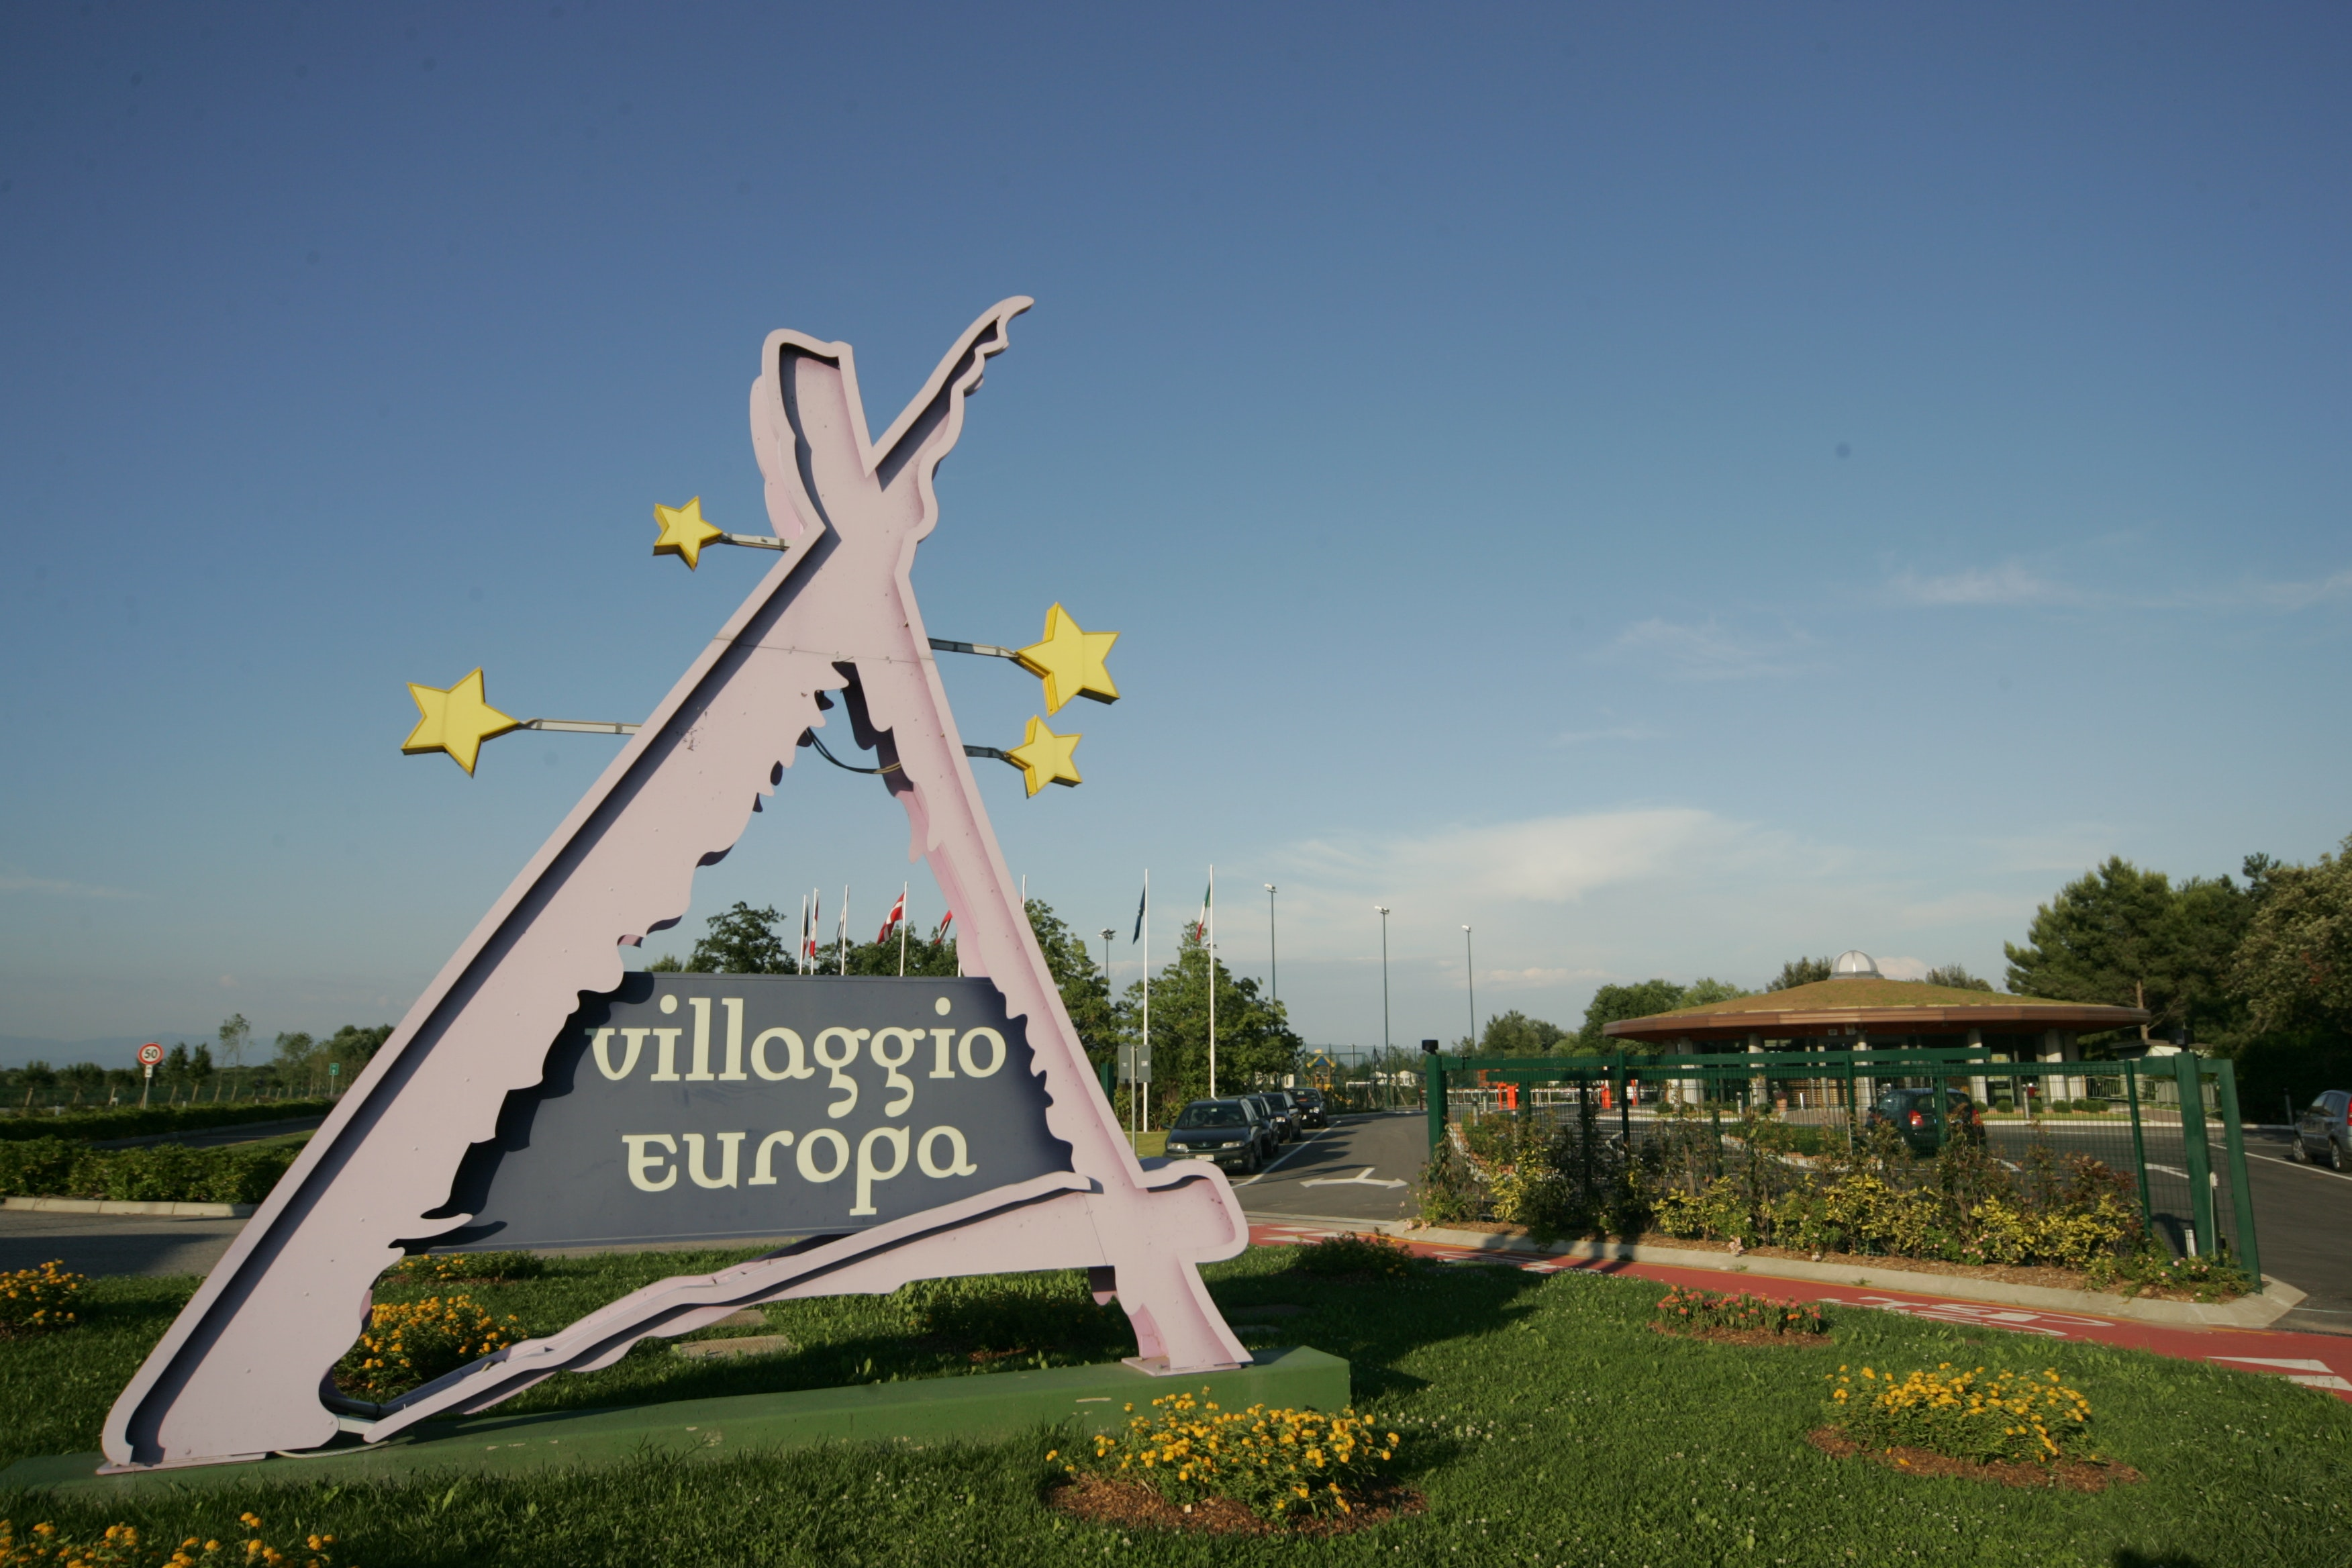 Entree camping Villaggio Europa